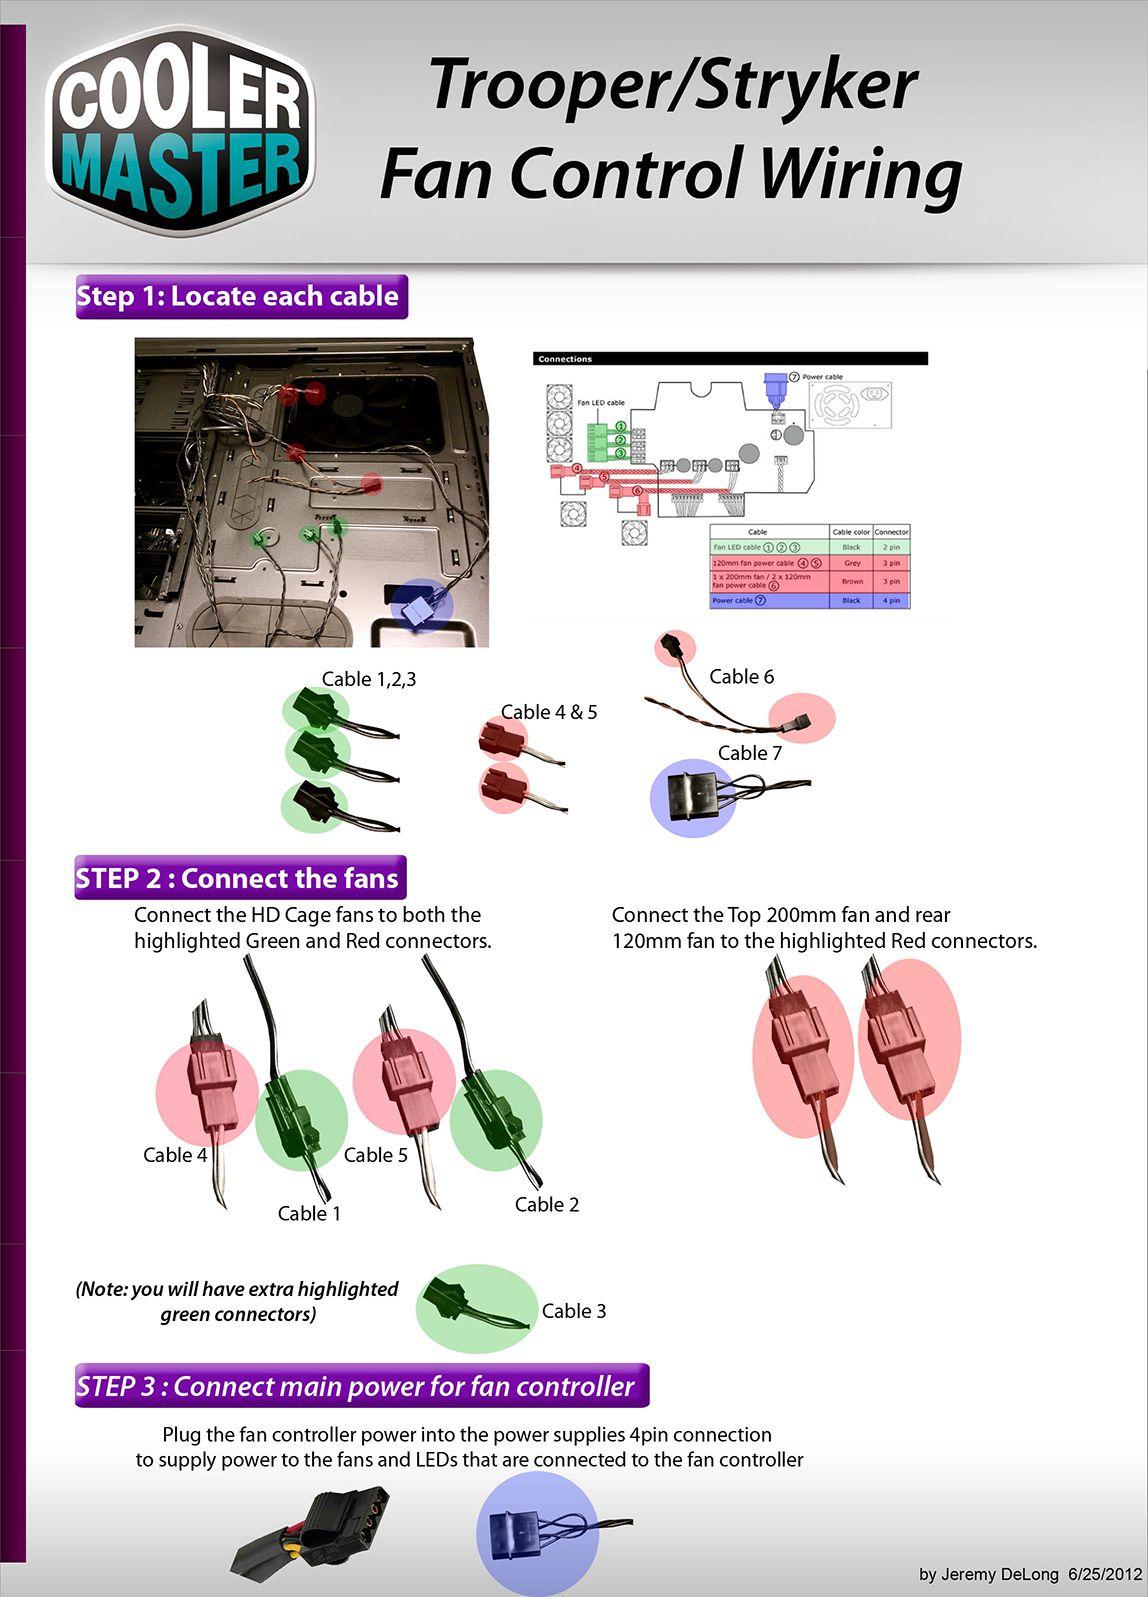 Storm Trooper / Stryker Fan Control Wiring Everything